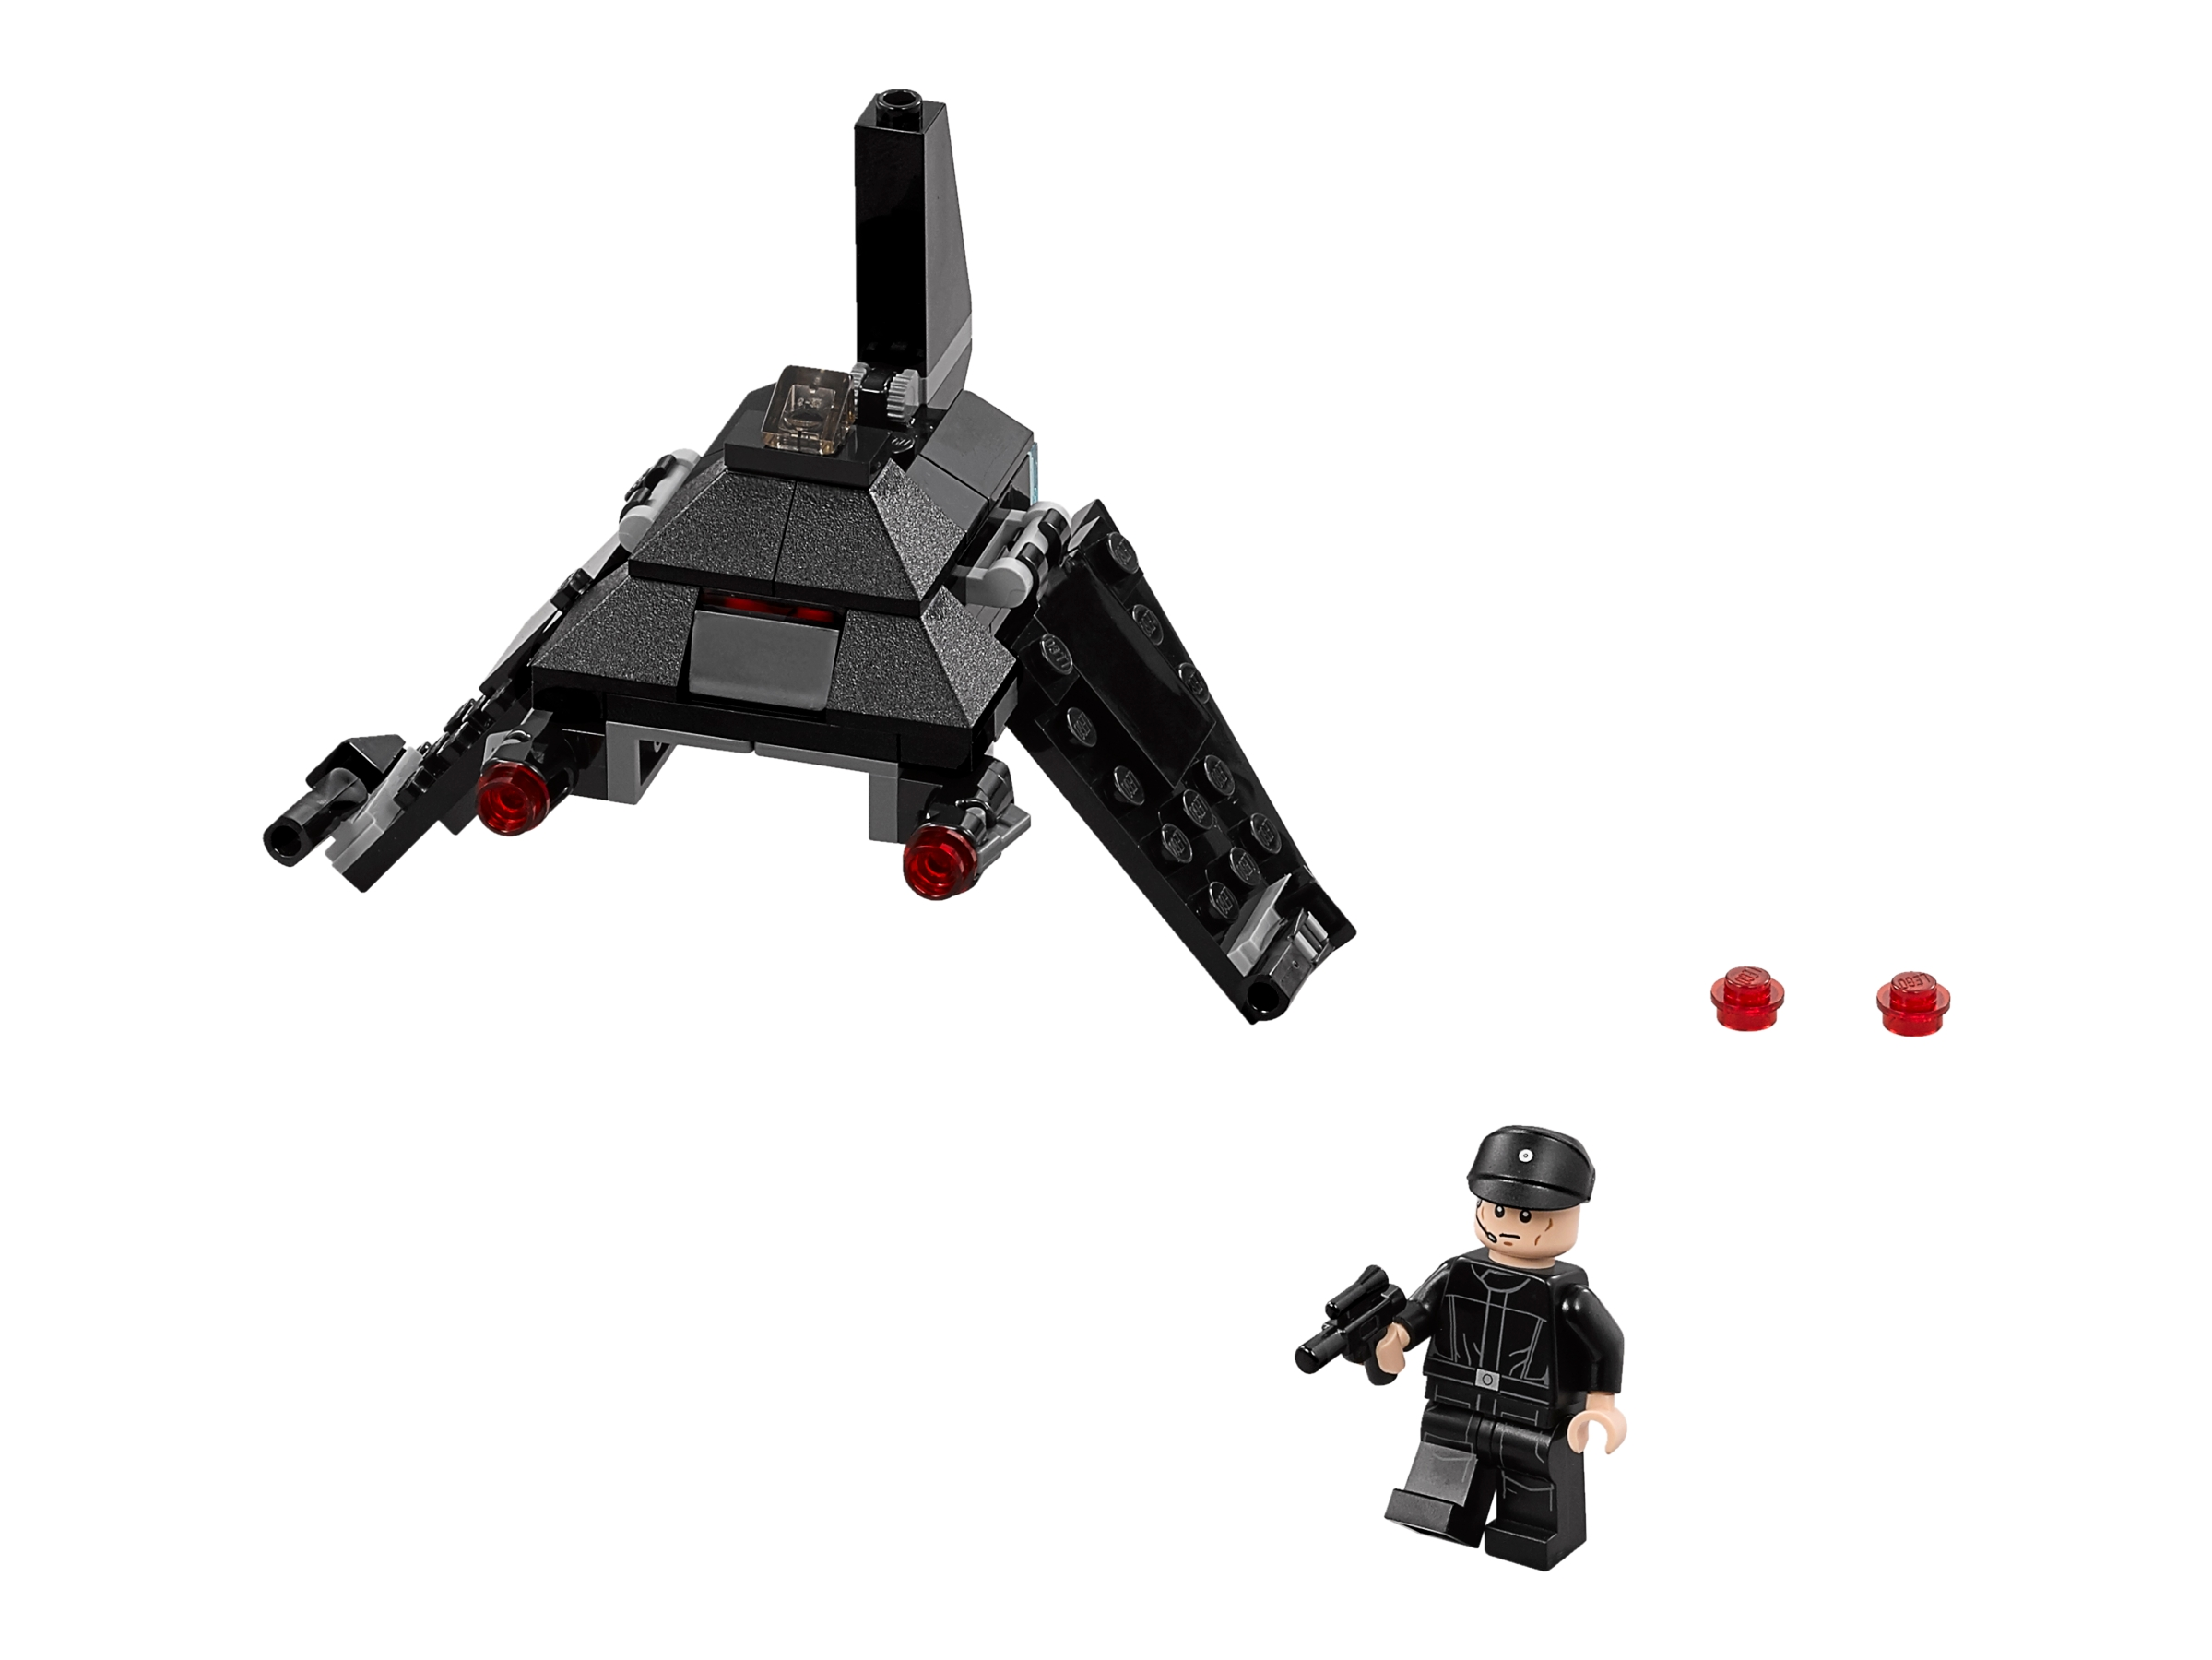 75163 LEGO Star Wars Microfighter Imperial Shuttle de Krennic